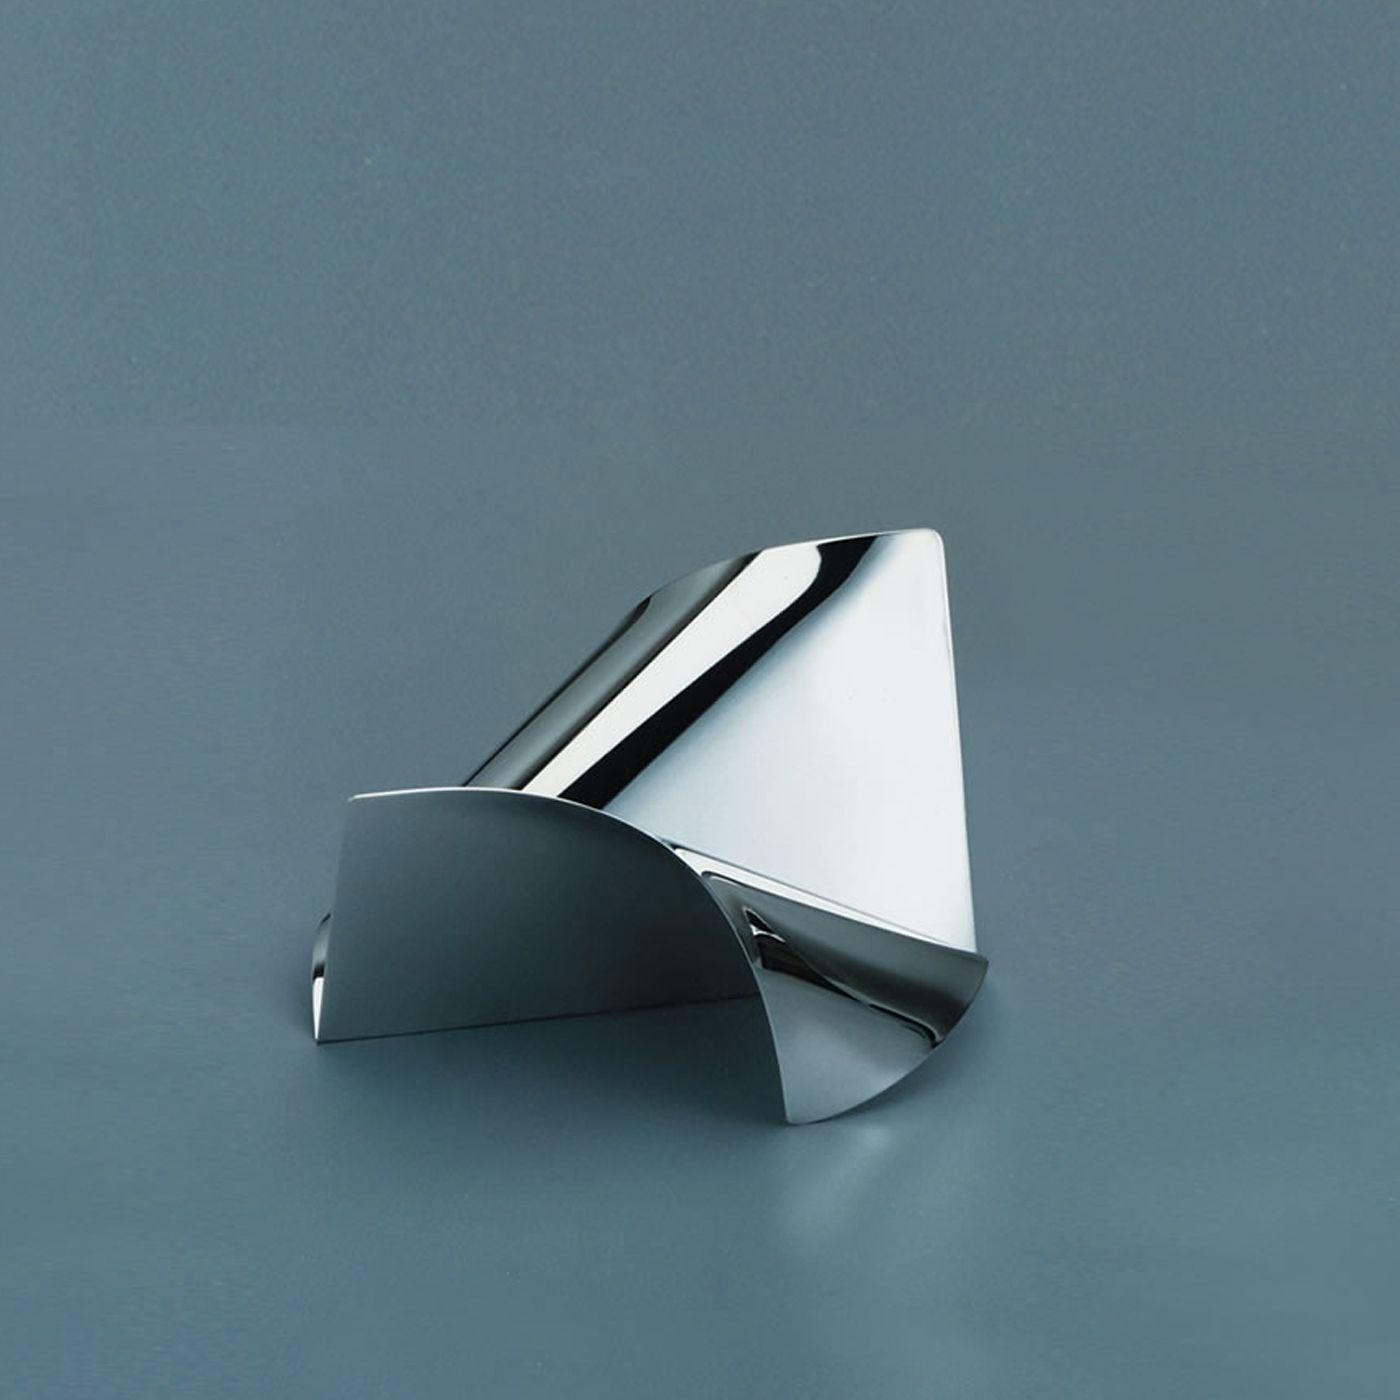 Soffio Brezza Silver Desk Set Silver Desk Desk Set Paper Holder